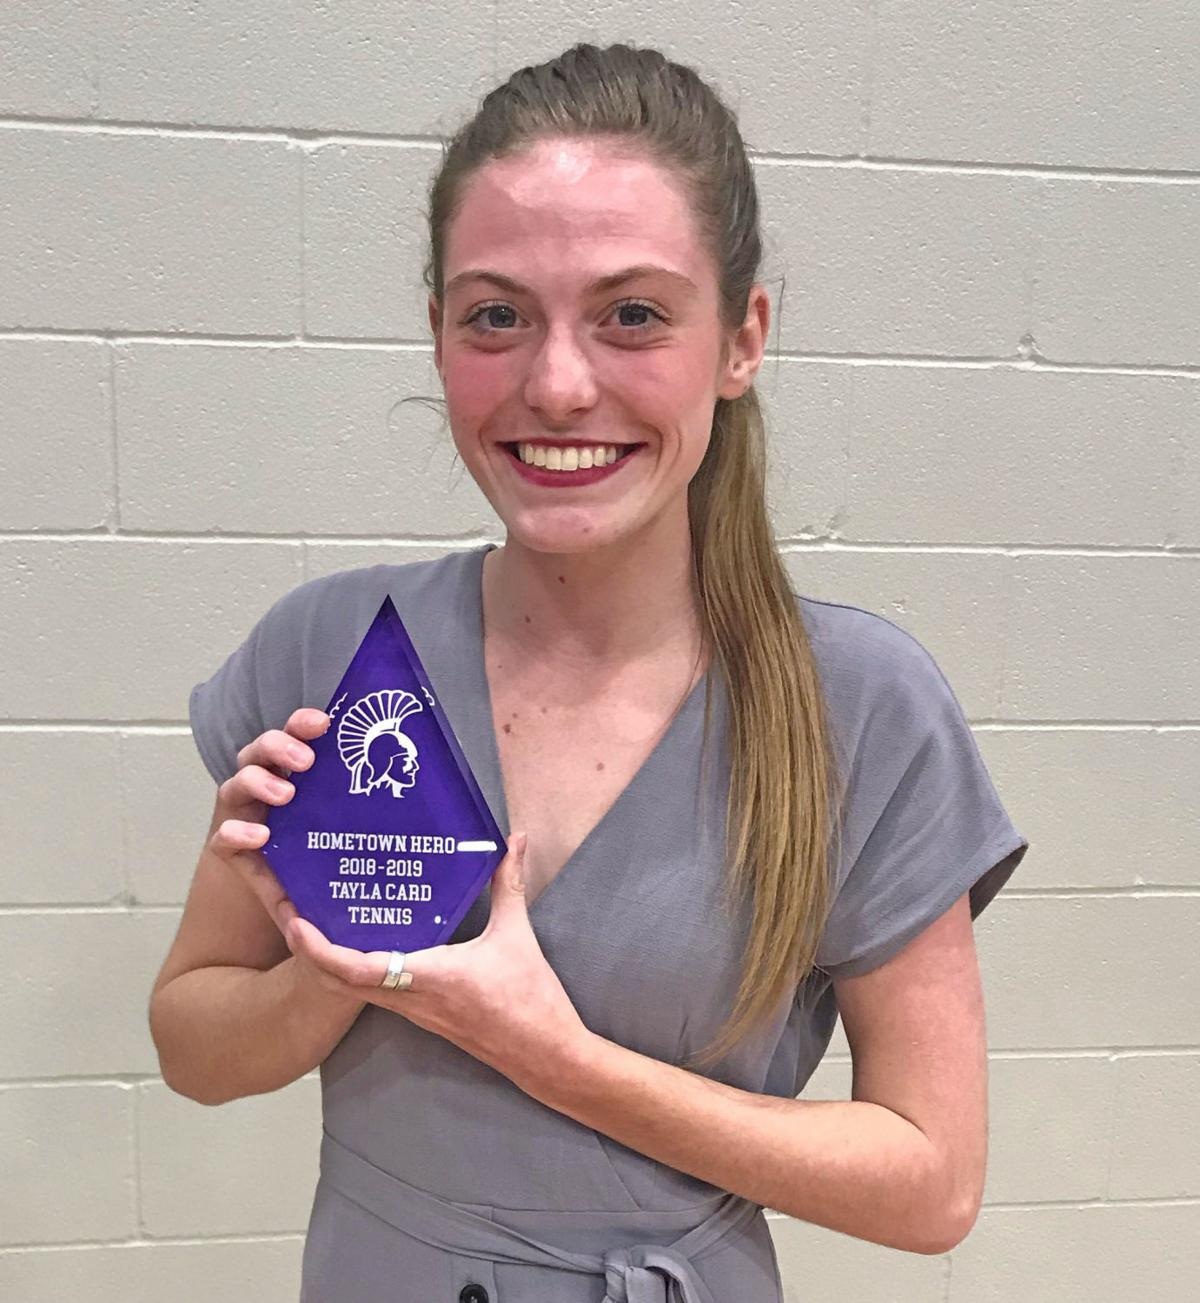 Tayla Card - Hometown Hero Award